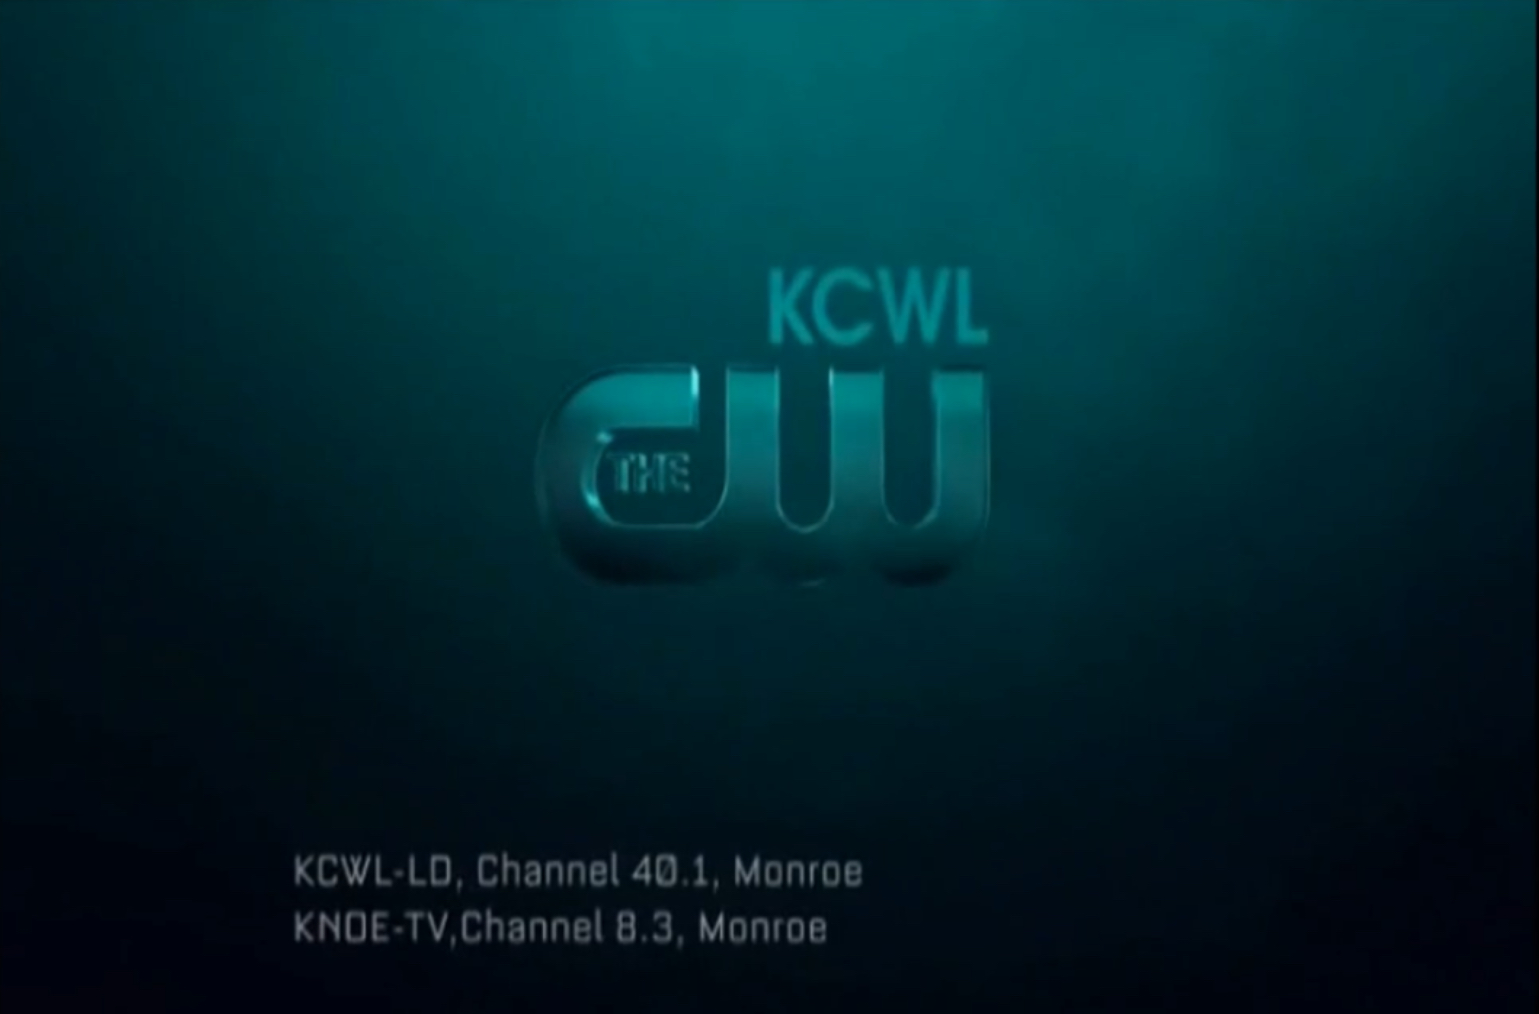 KCWL-LD